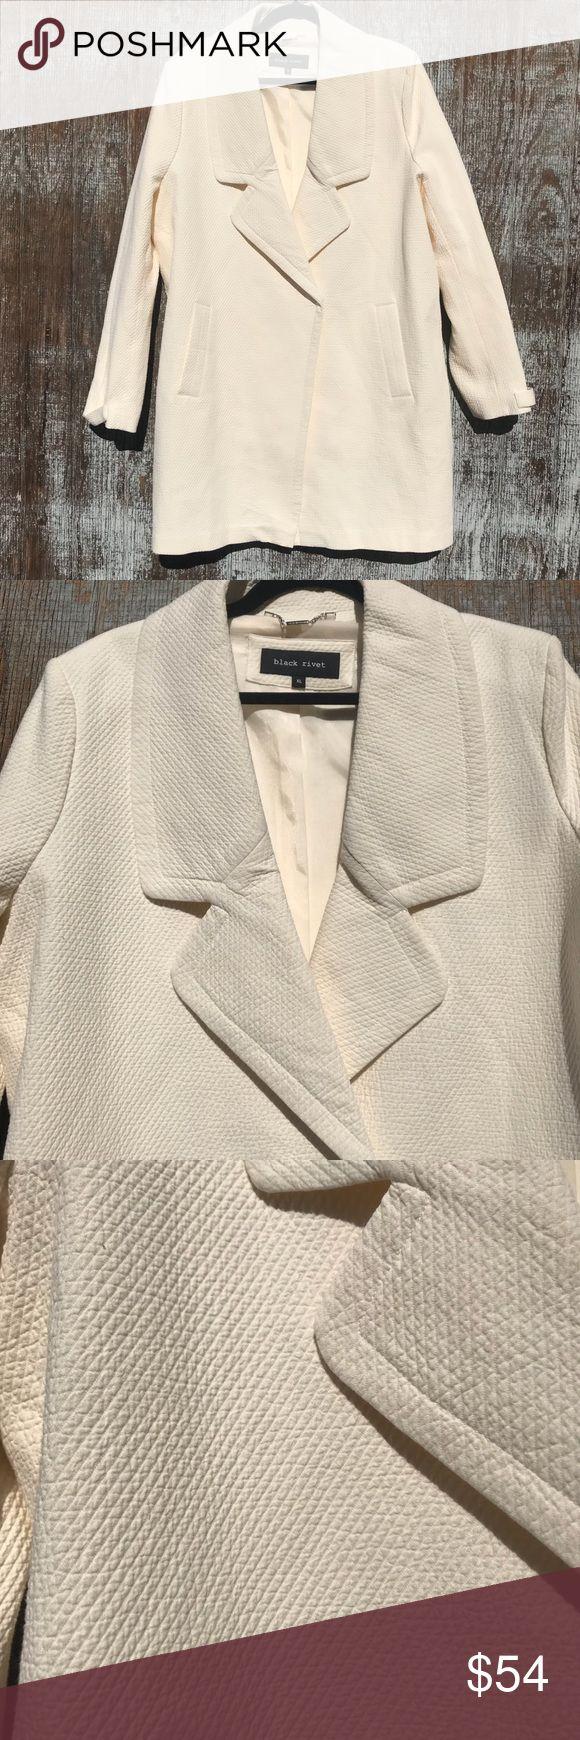 Black Rivet cream jacket XL NWOT Cream Black Rivet women's jacket invisible button closure with pockets Jackets & Coats Pea Coats